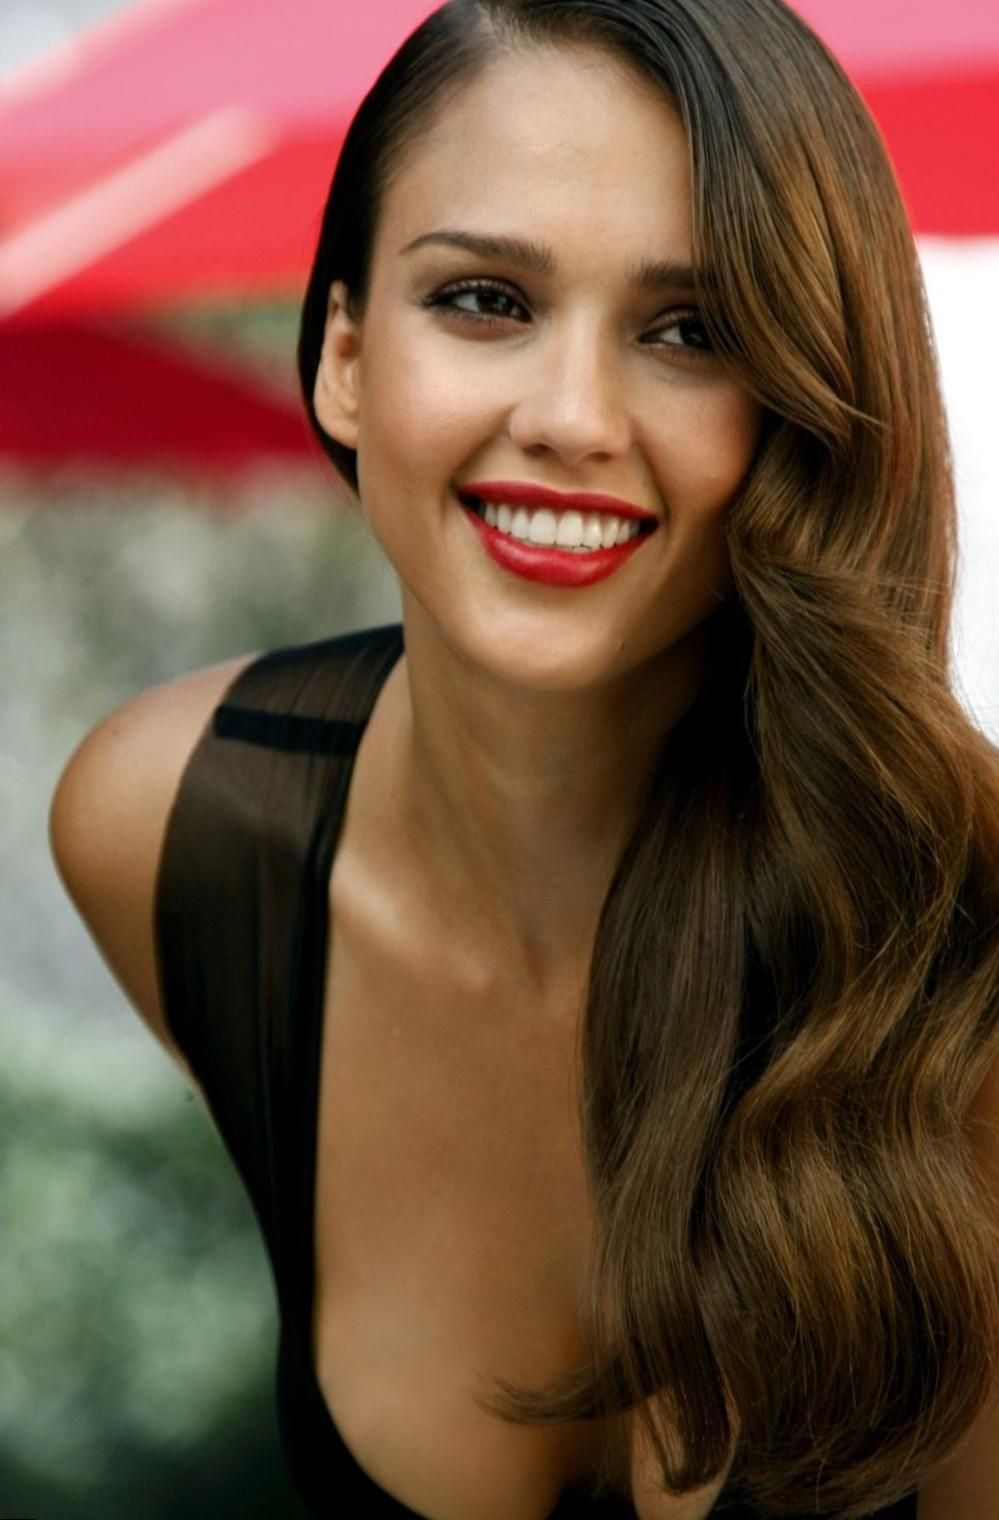 Jessica Alba Top Best Looks Photos Video